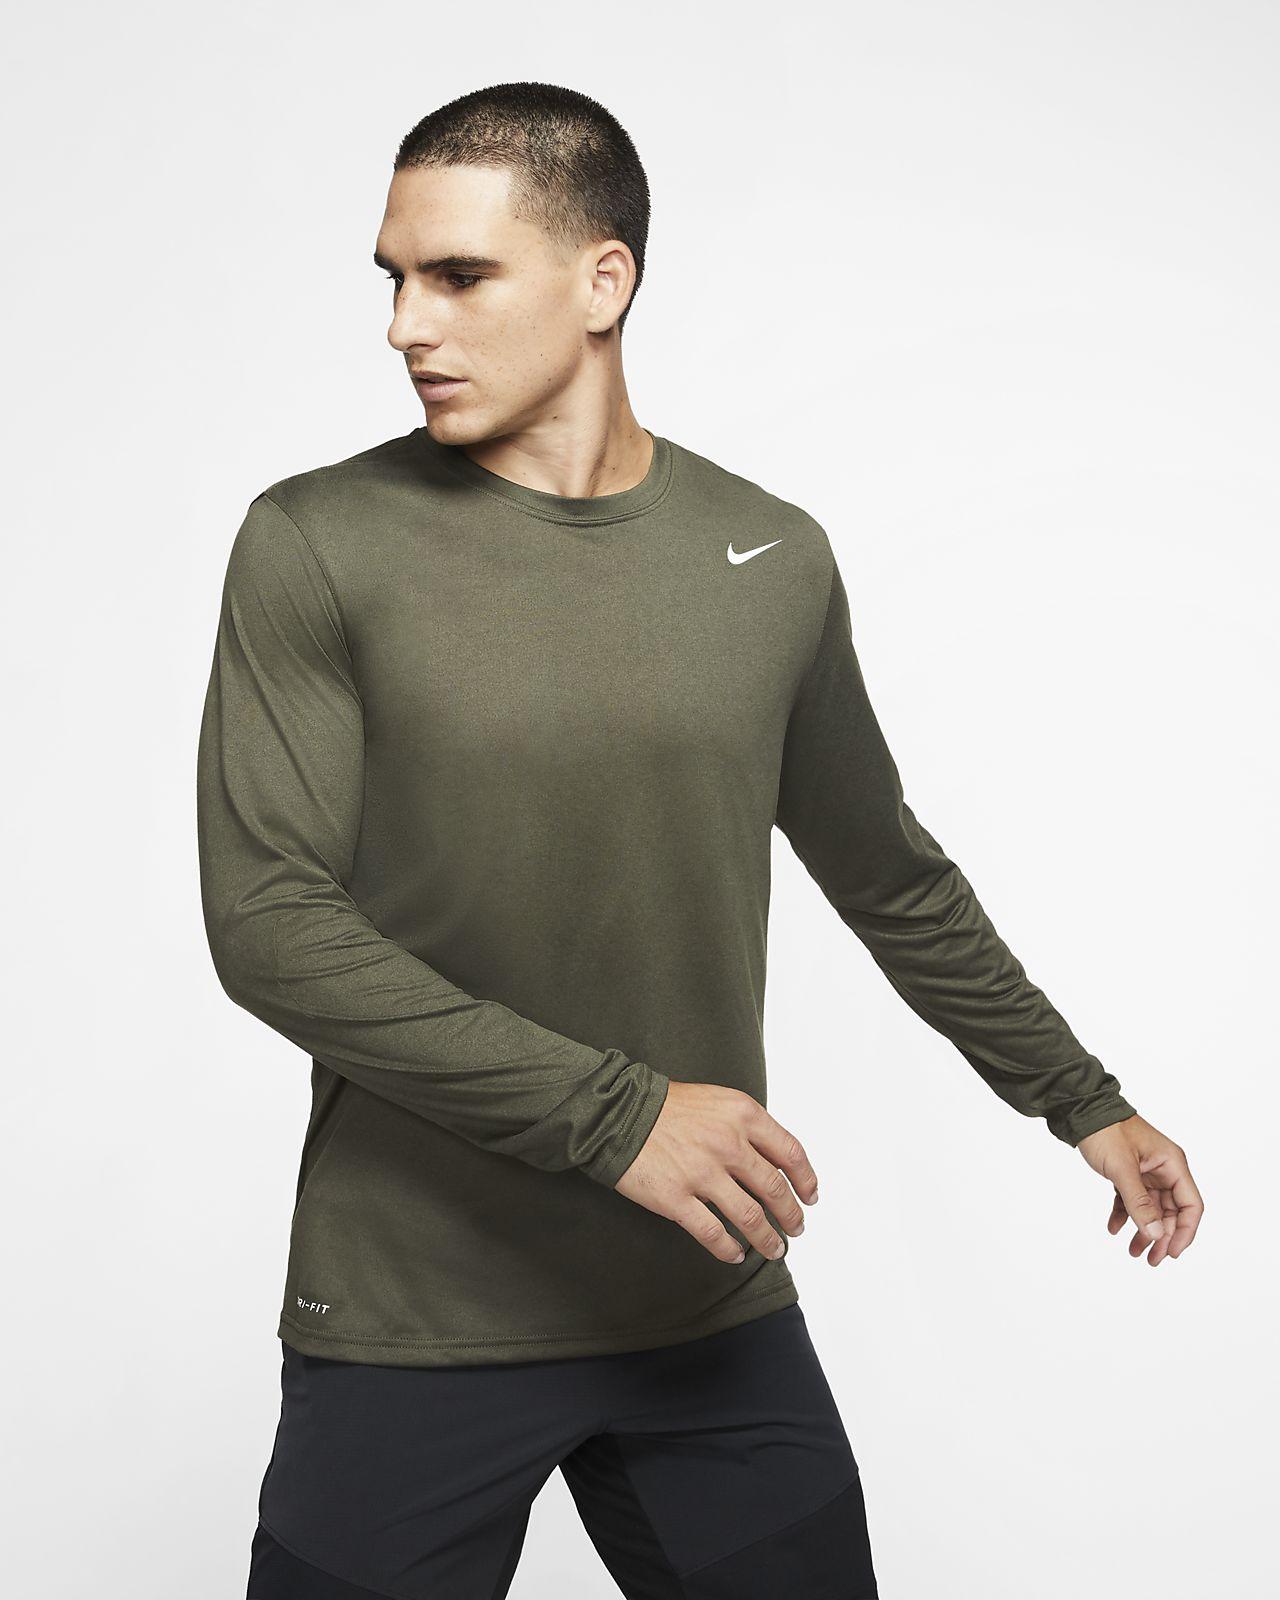 Nike Dri-FIT Legend 2.0 Men's Long-Sleeve Training Top